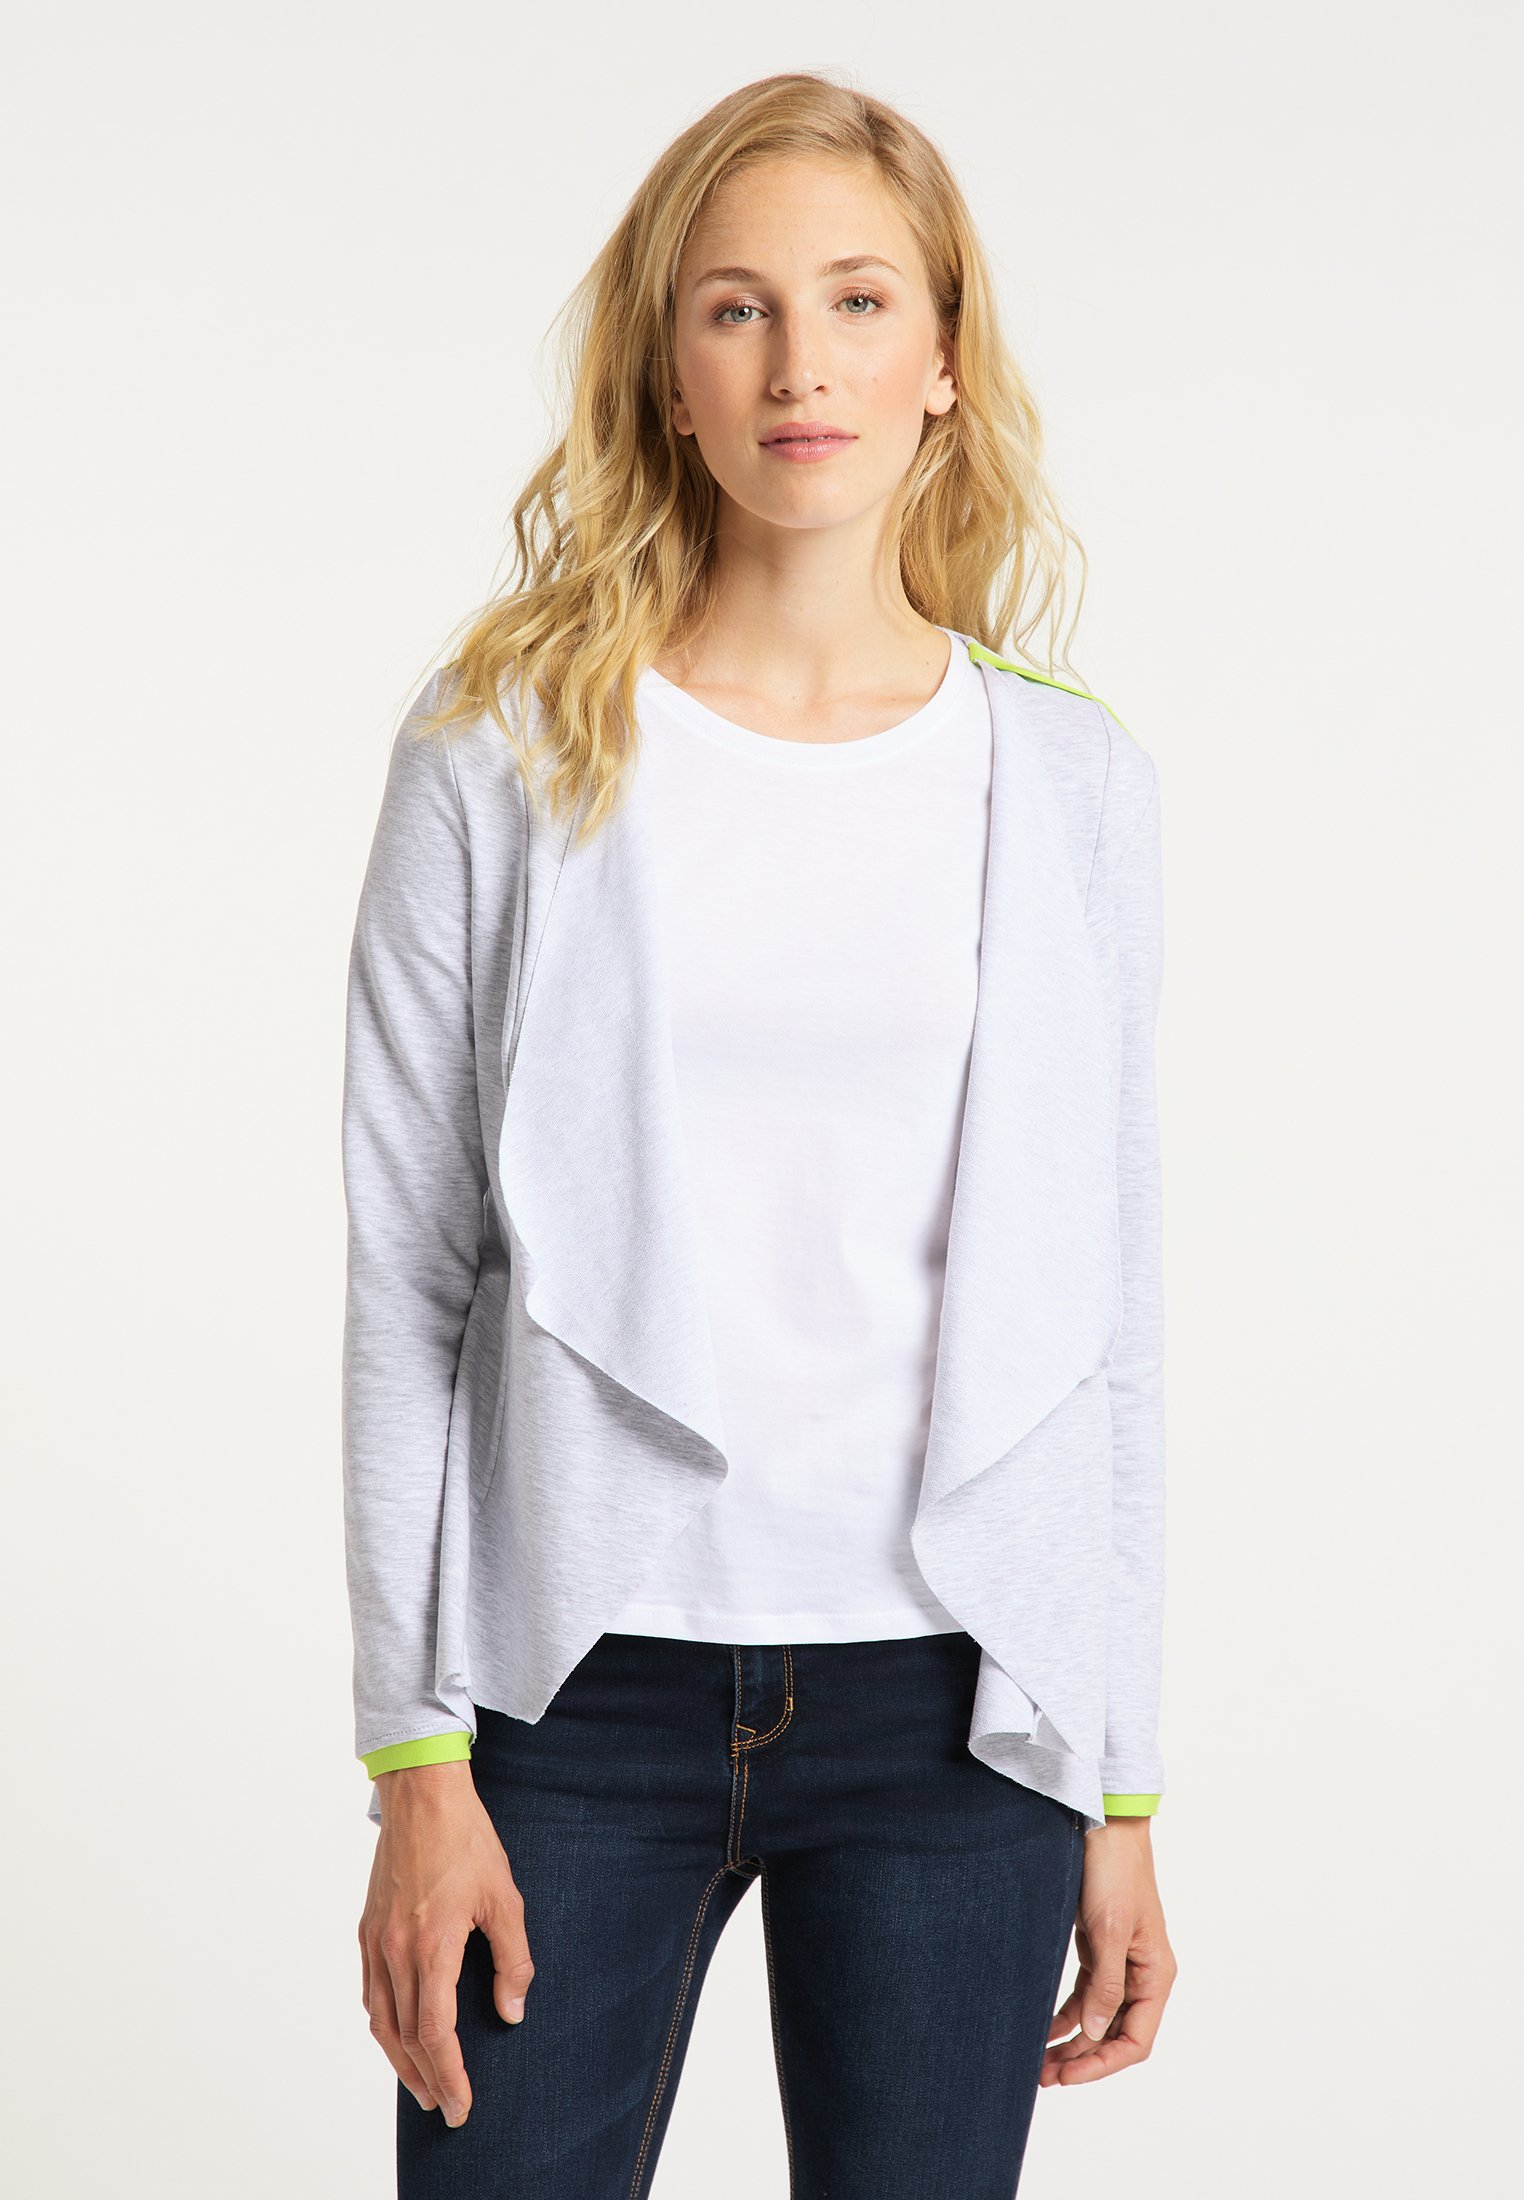 Top Quality Women's Clothing usha CARDIGAN Cardigan grau u23p8a10k